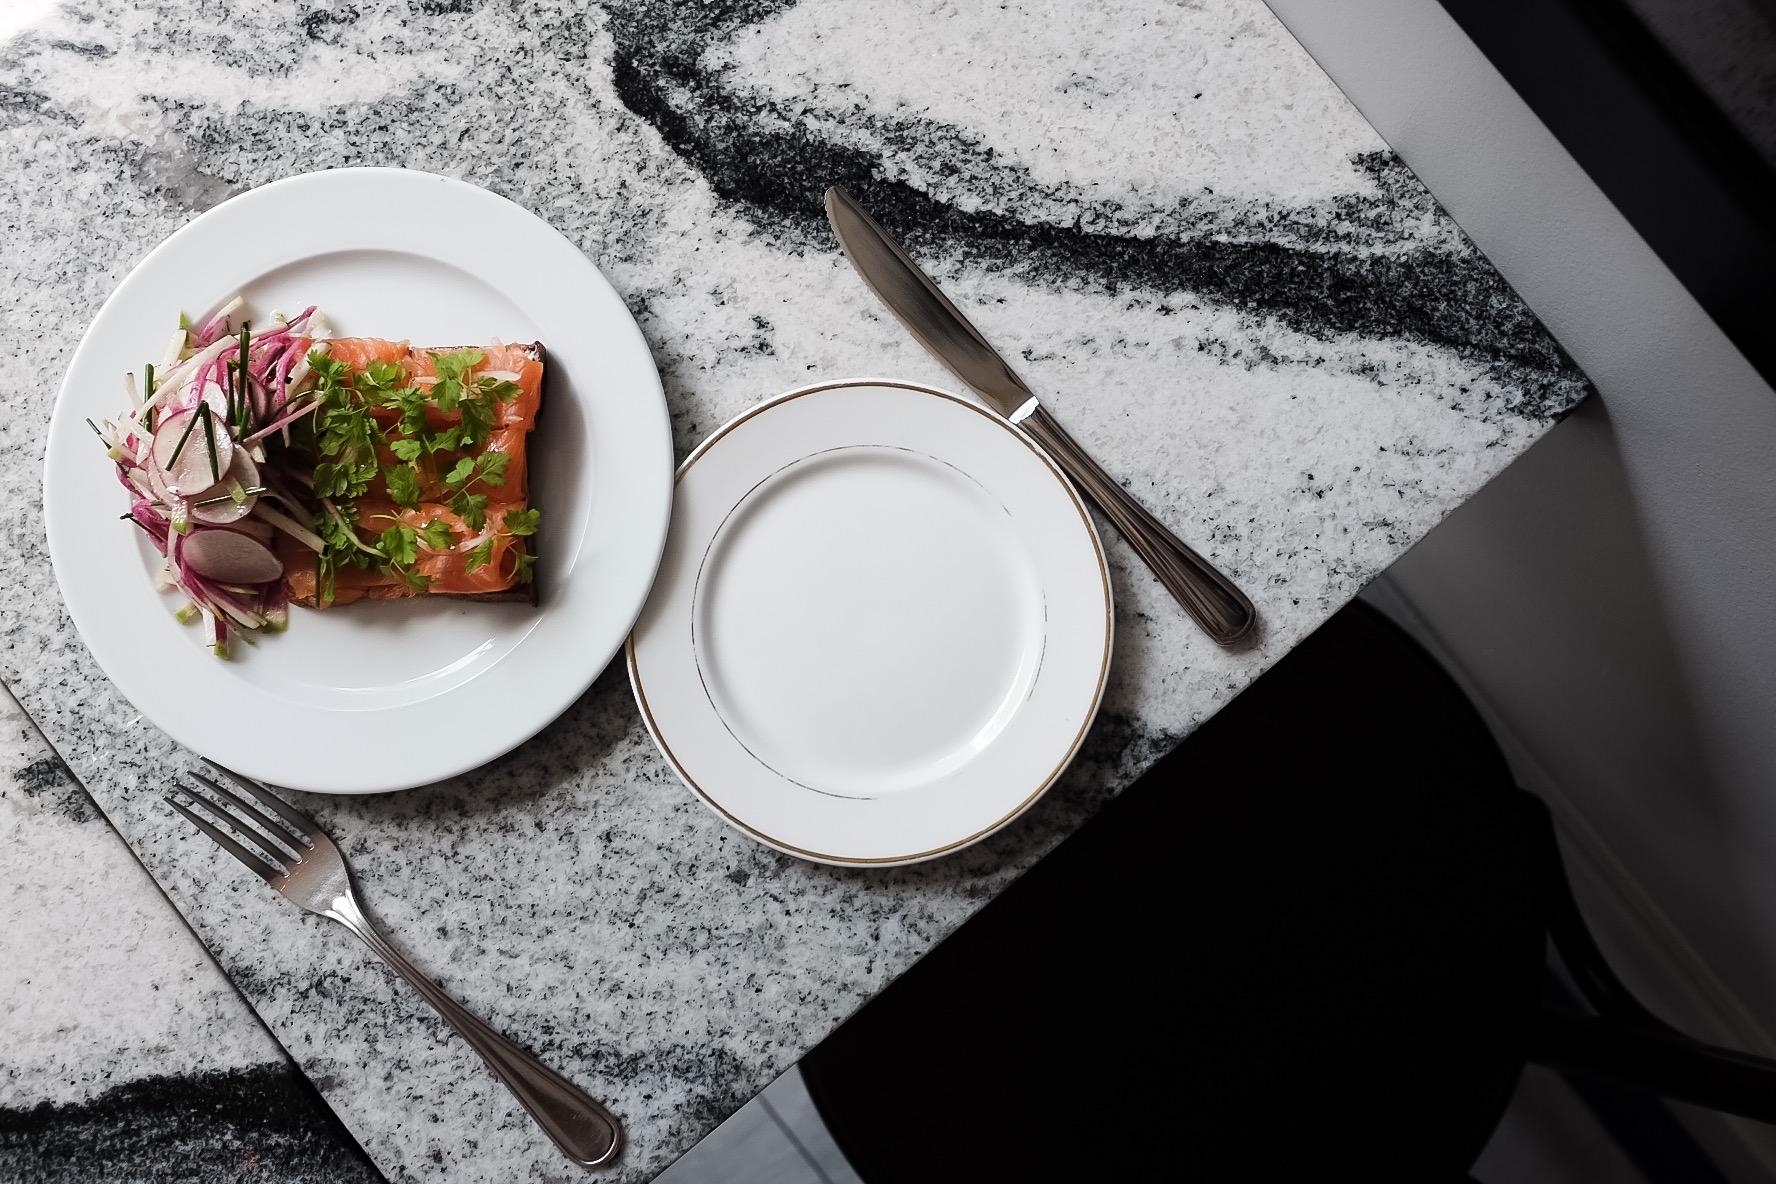 The beautiful Trout Tartine and a fresh radish salad.